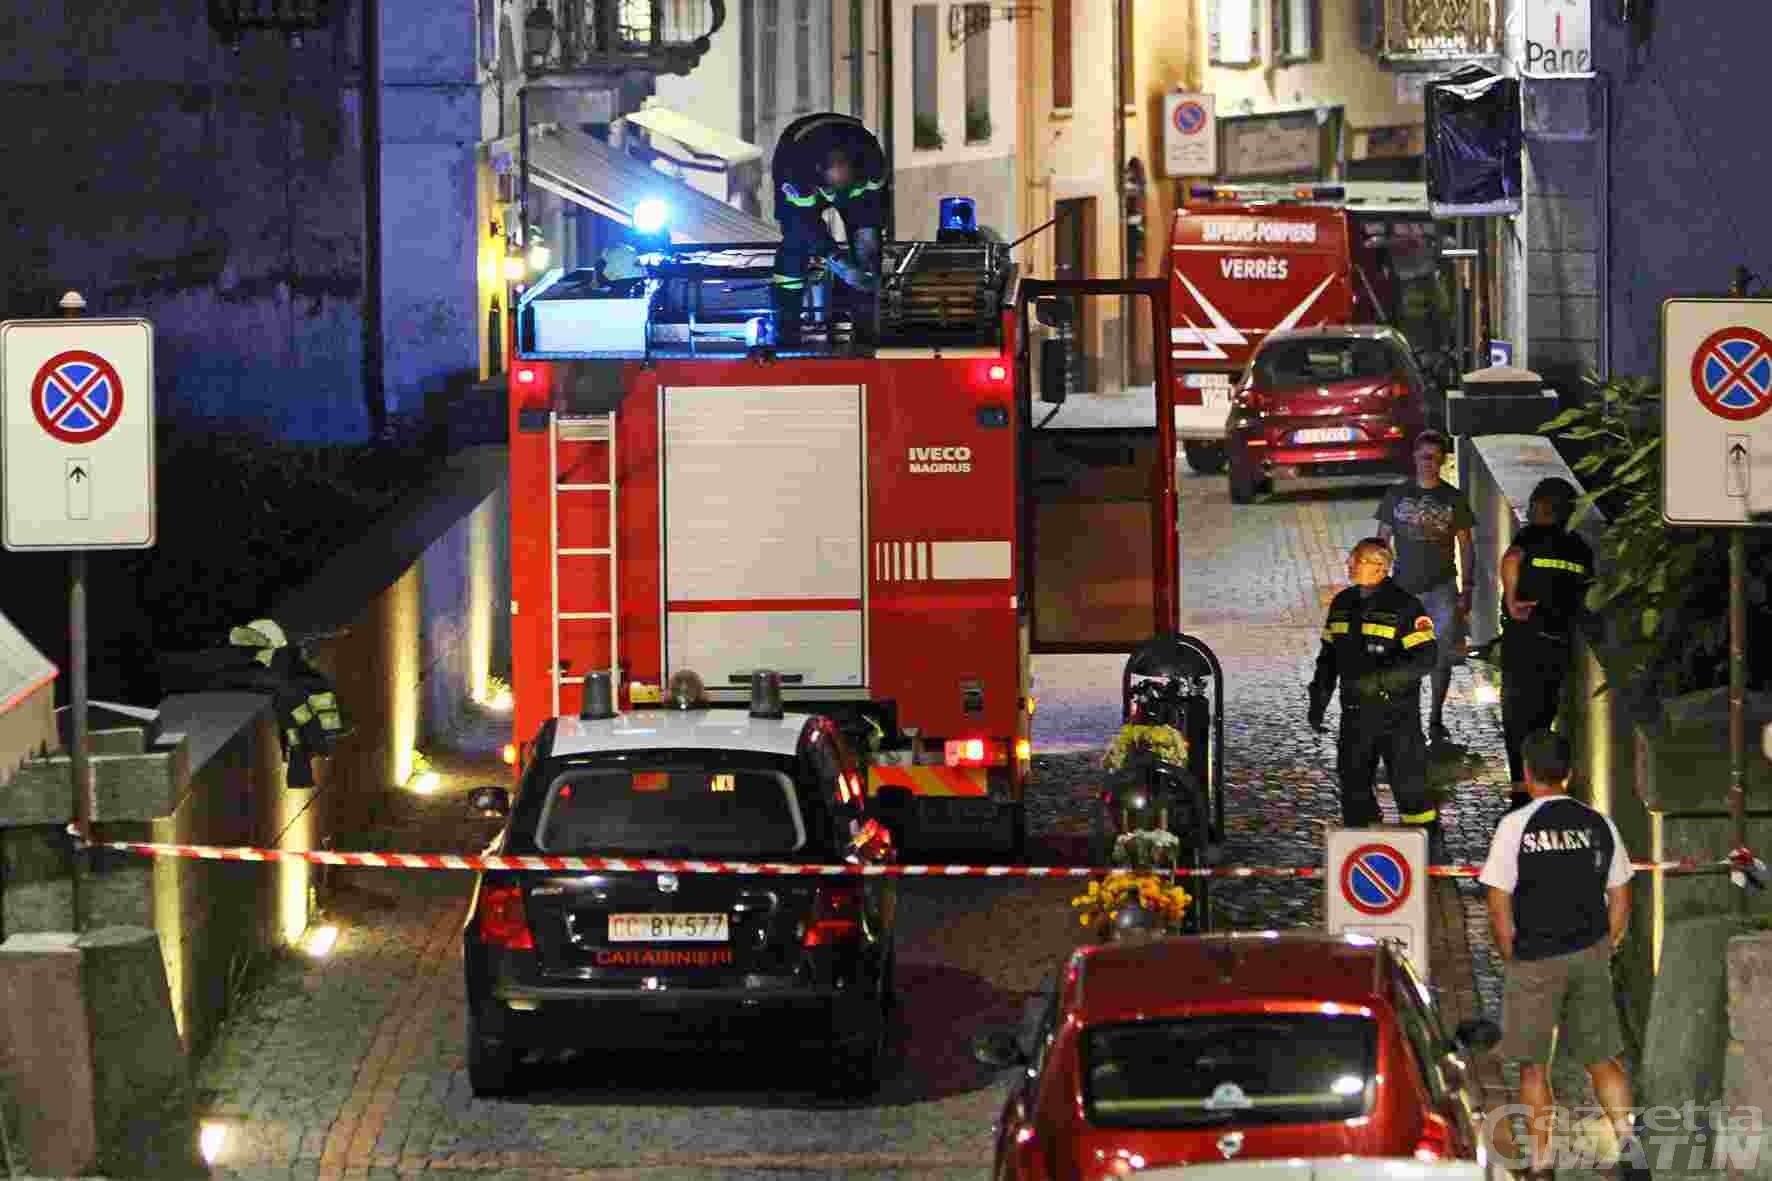 Suicidio o incidente: mistero a Verrès